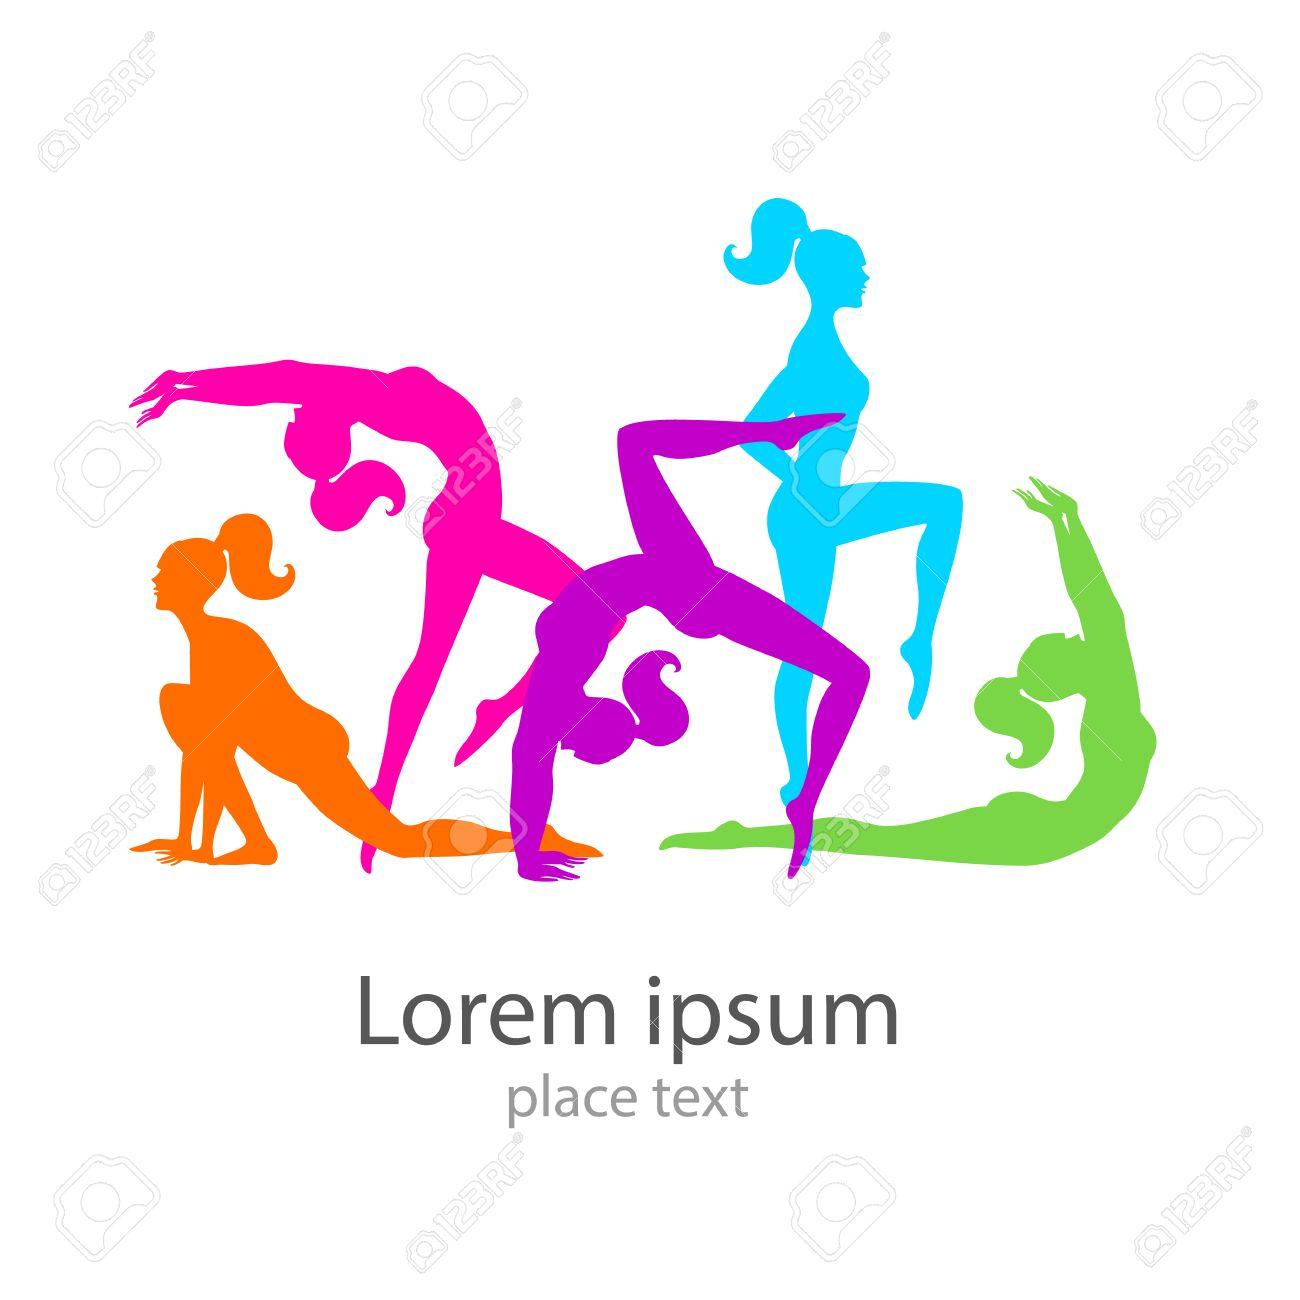 female sports template logo fitness gym health beauty